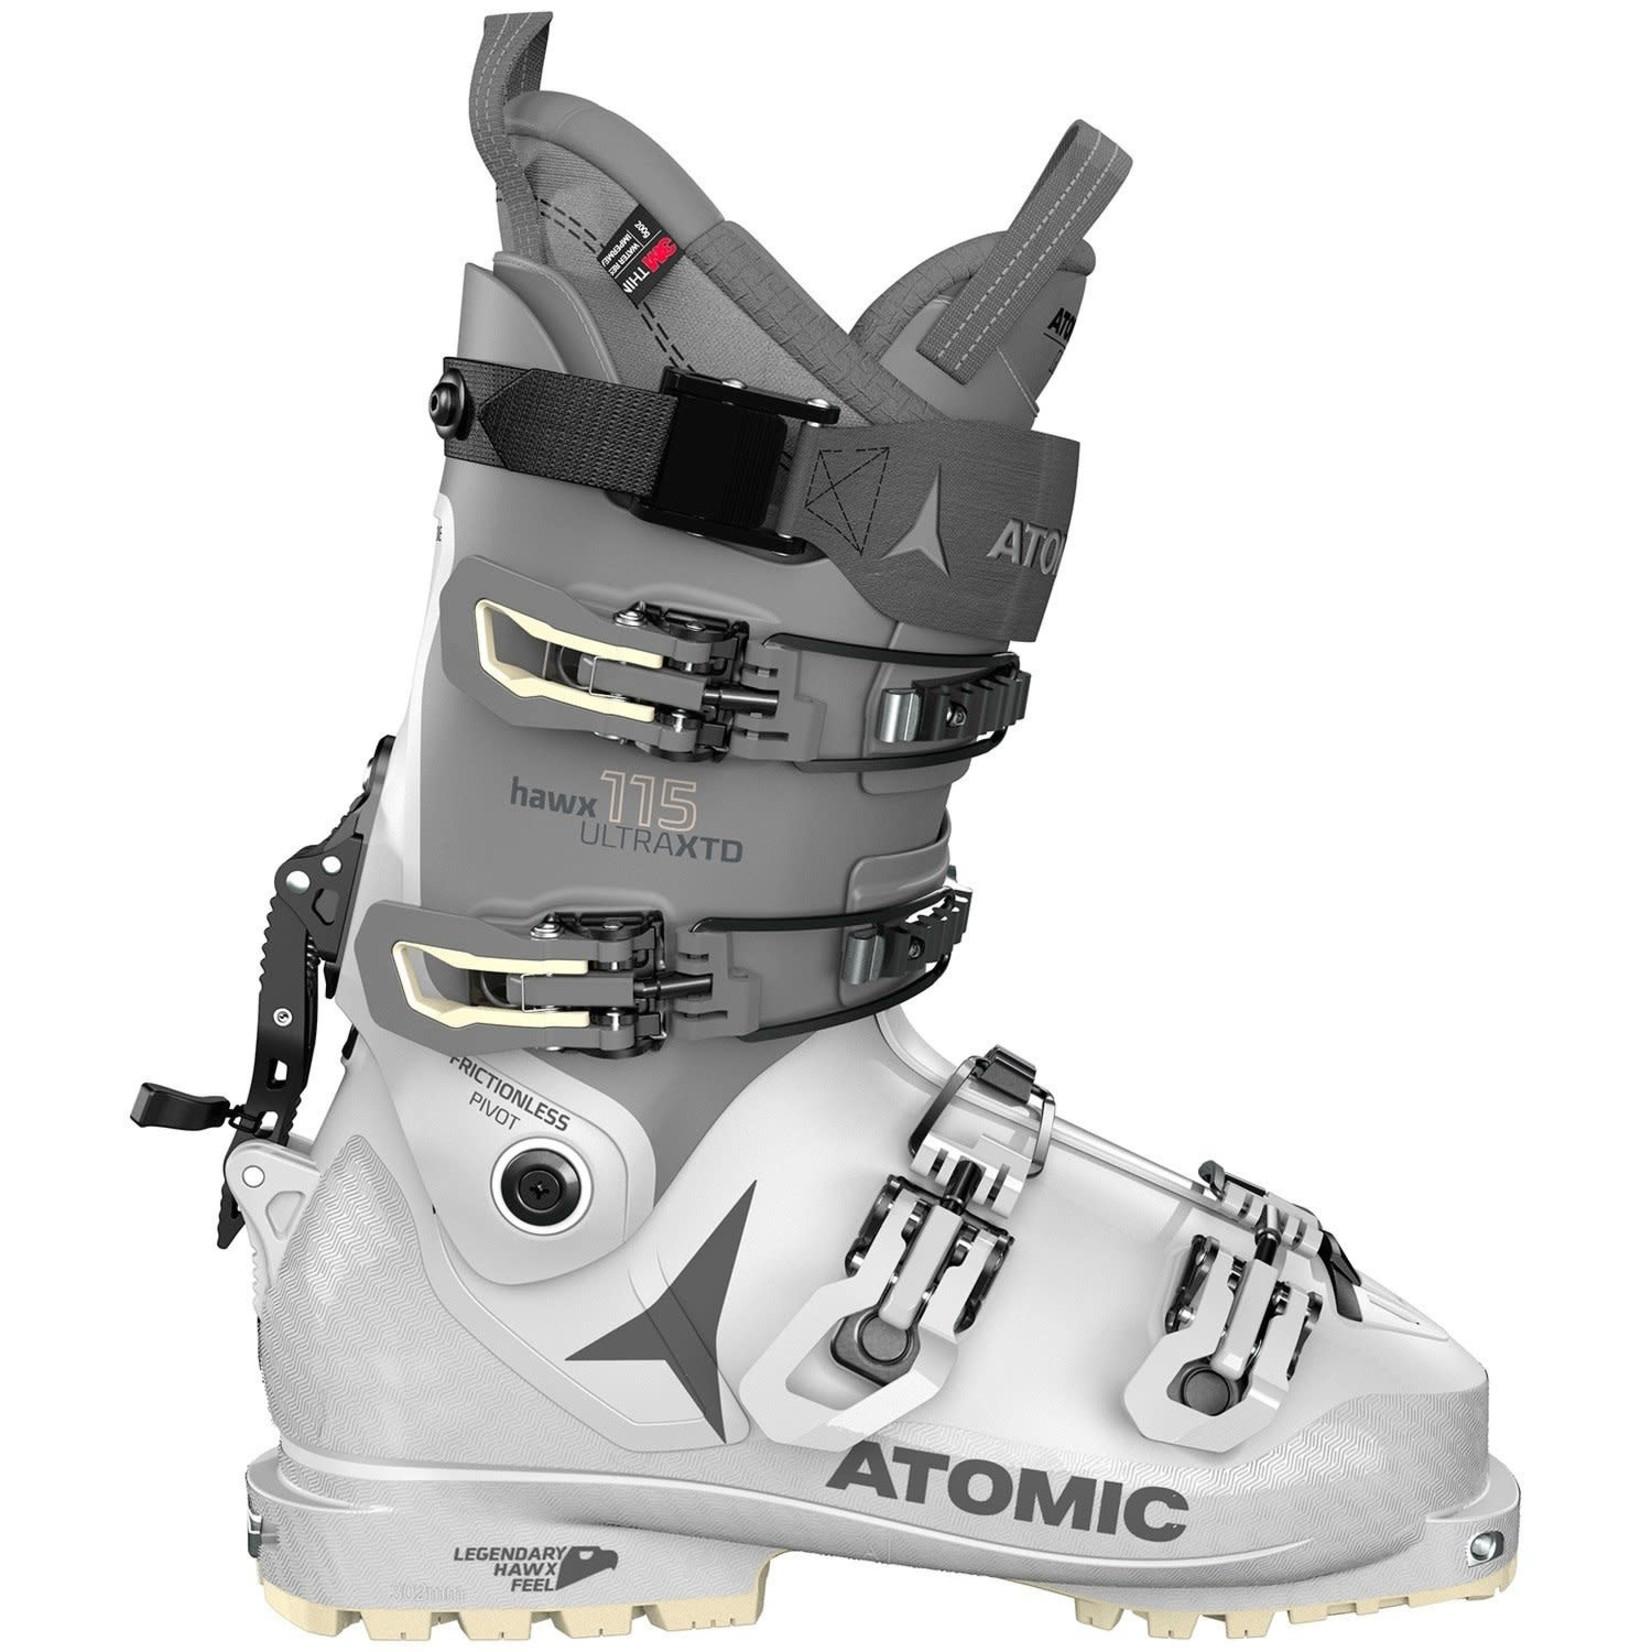 Atomic Bottes Atomic Hawx Ultra XTD 115 - Femmes